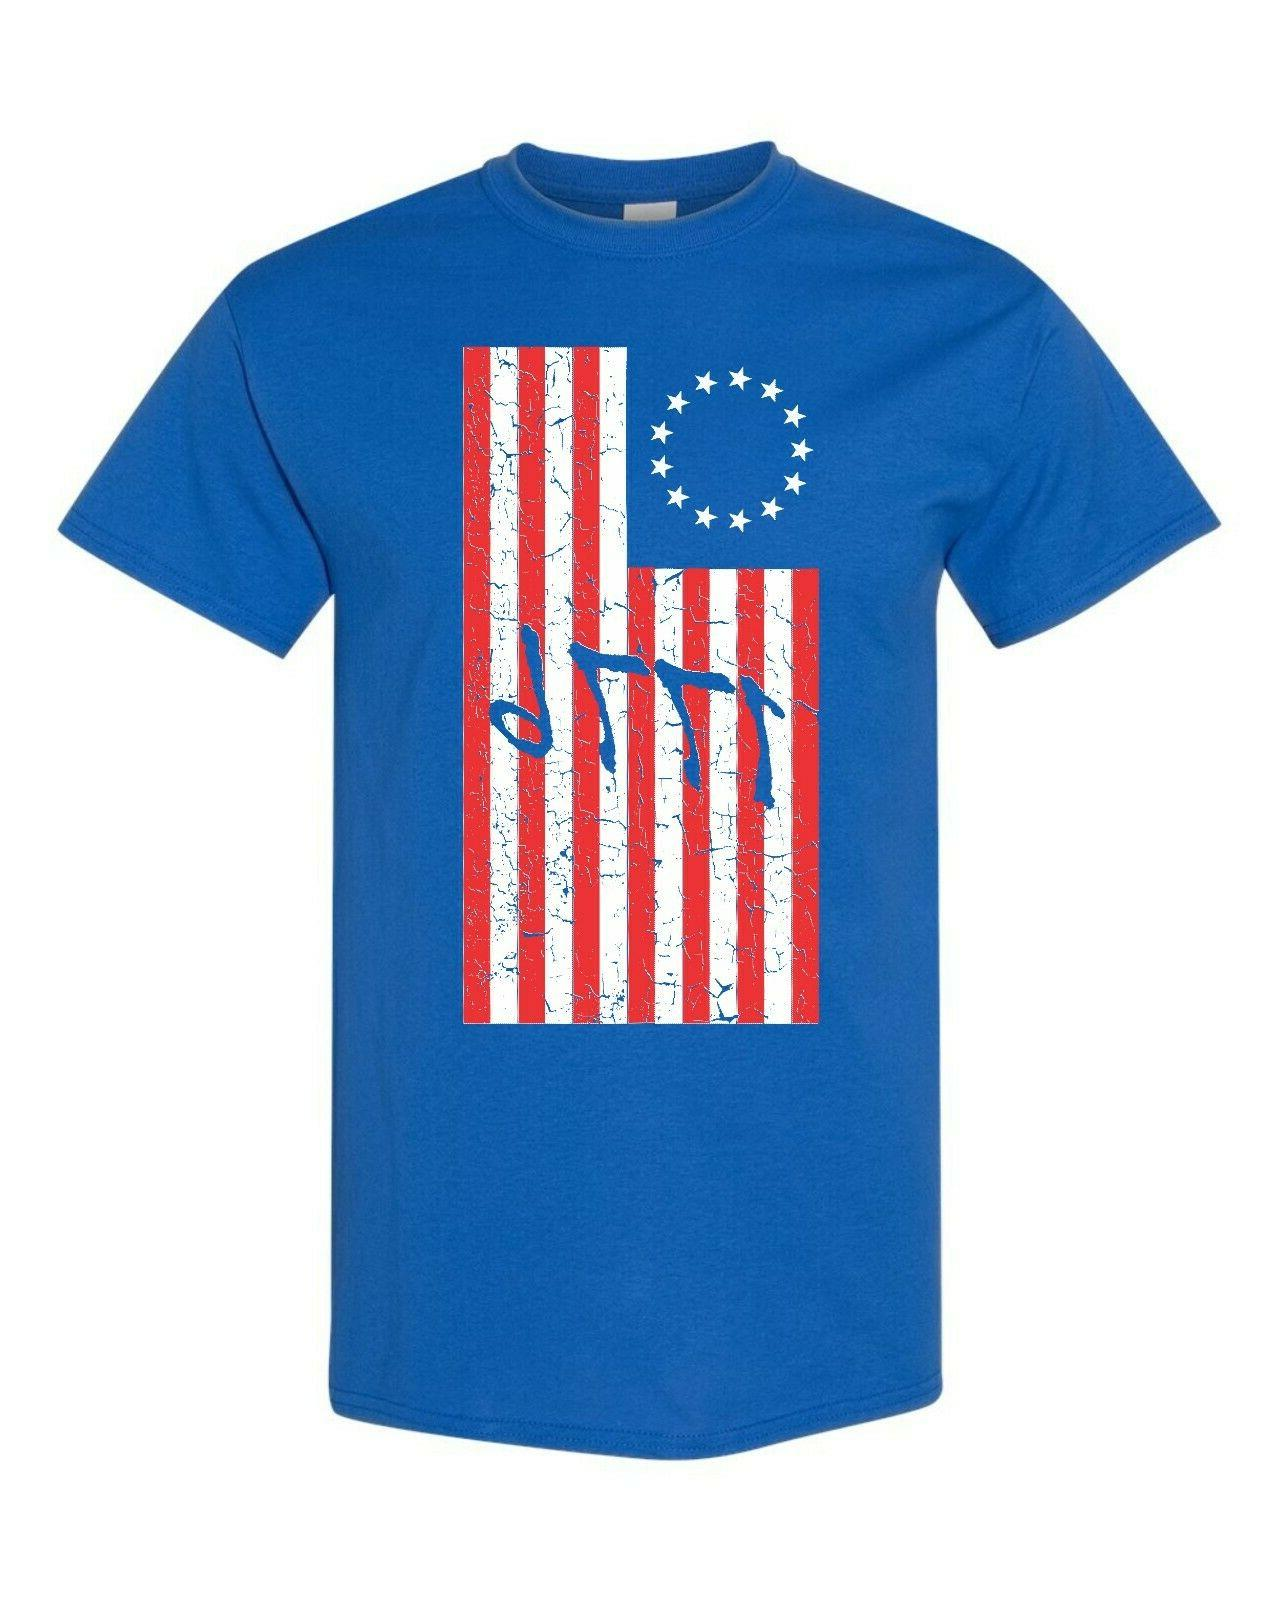 1776 Betsy Star Original United States America Shirt 999